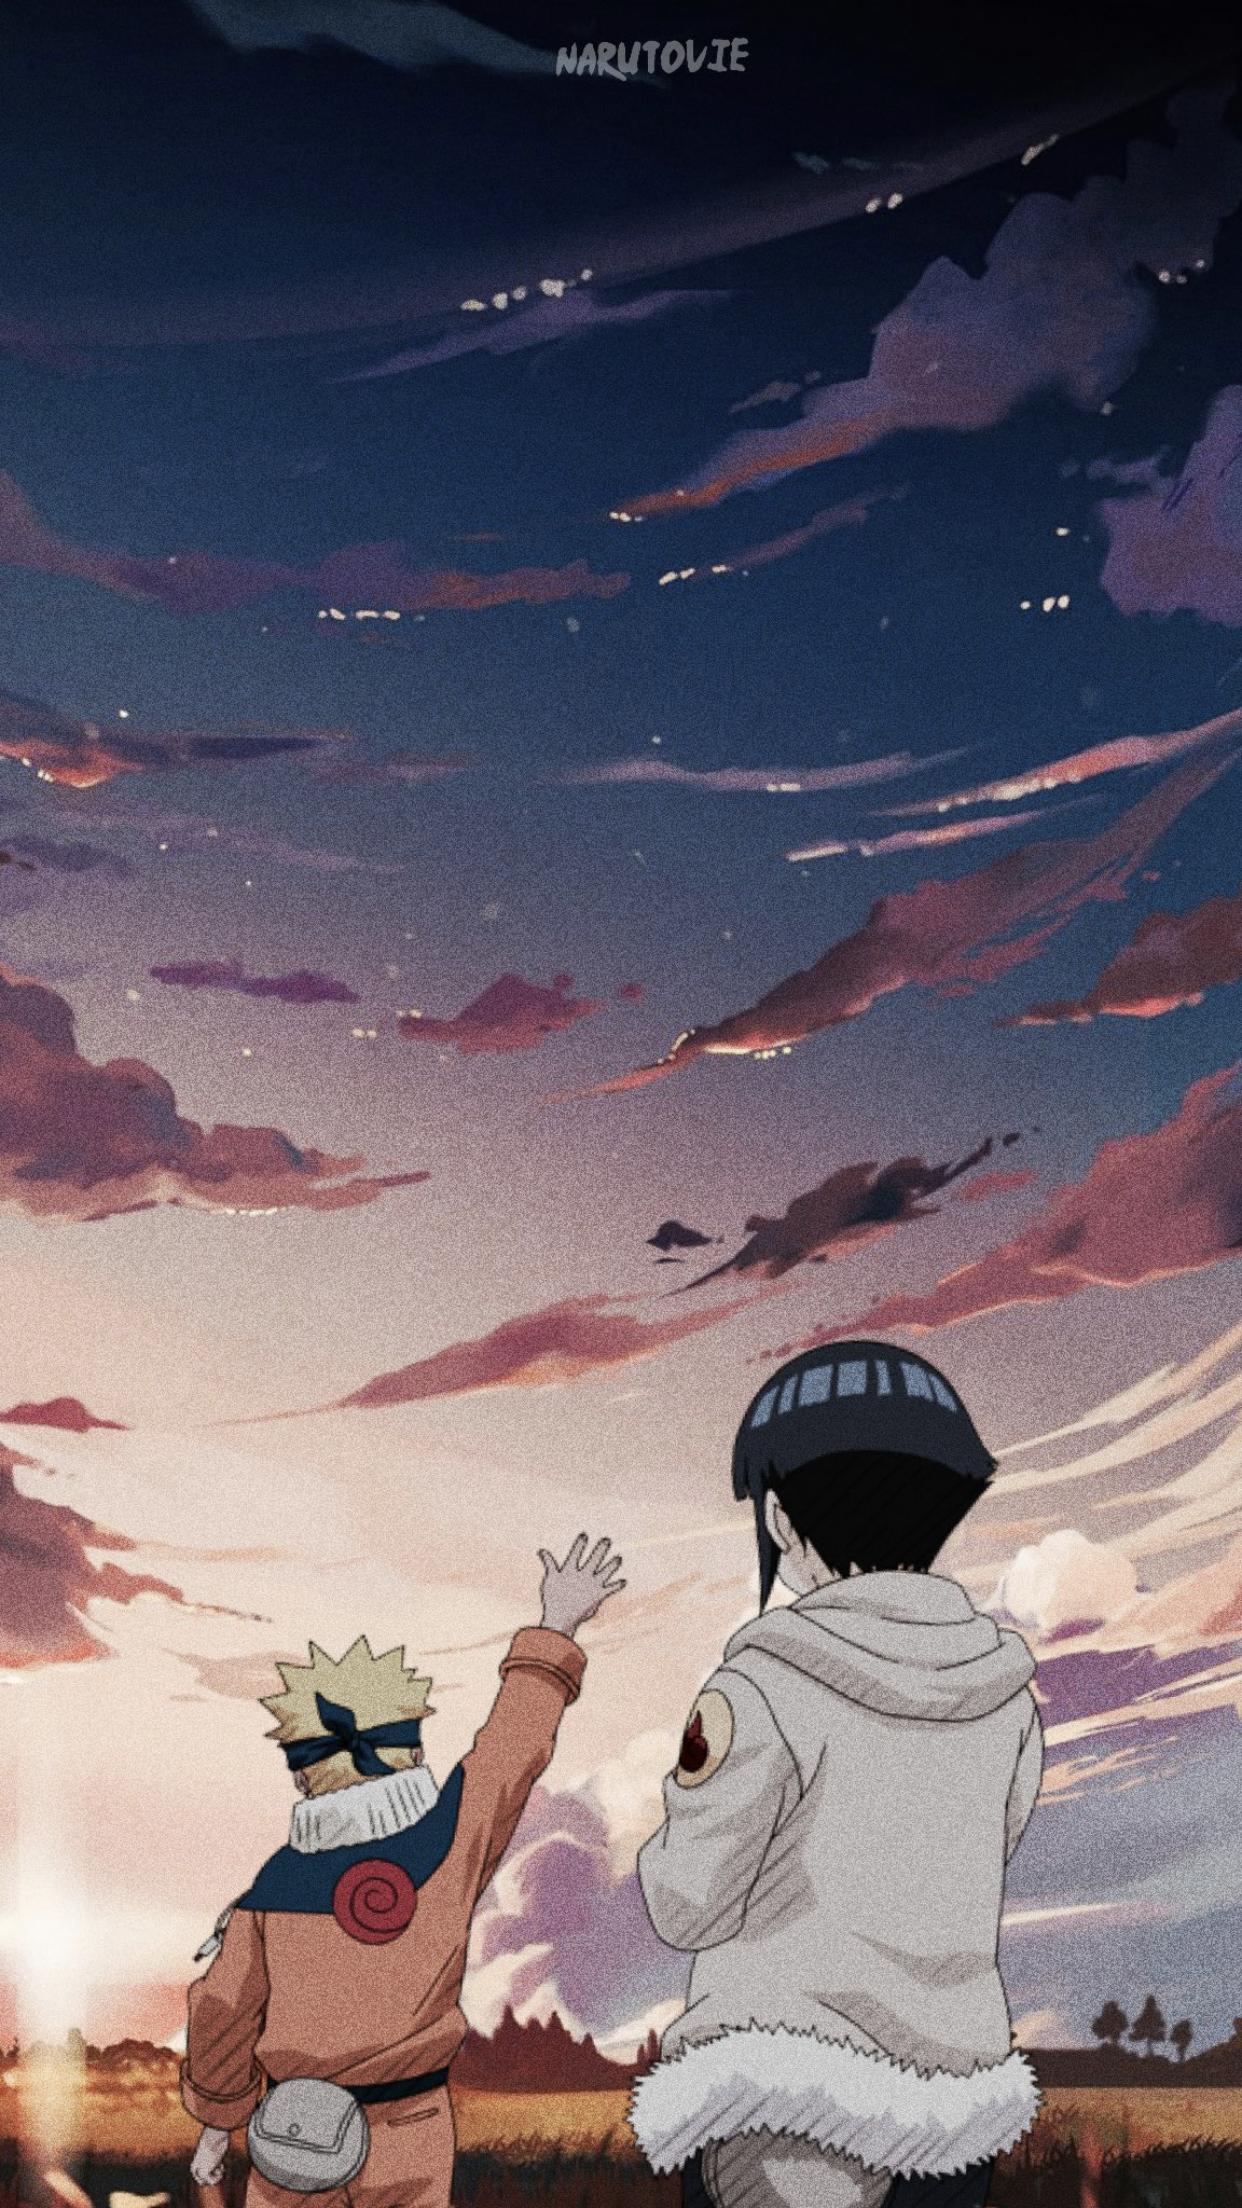 Pin De Tiara Koutaro Em Wallpapers Personagens De Anime Anime Animes Wallpapers